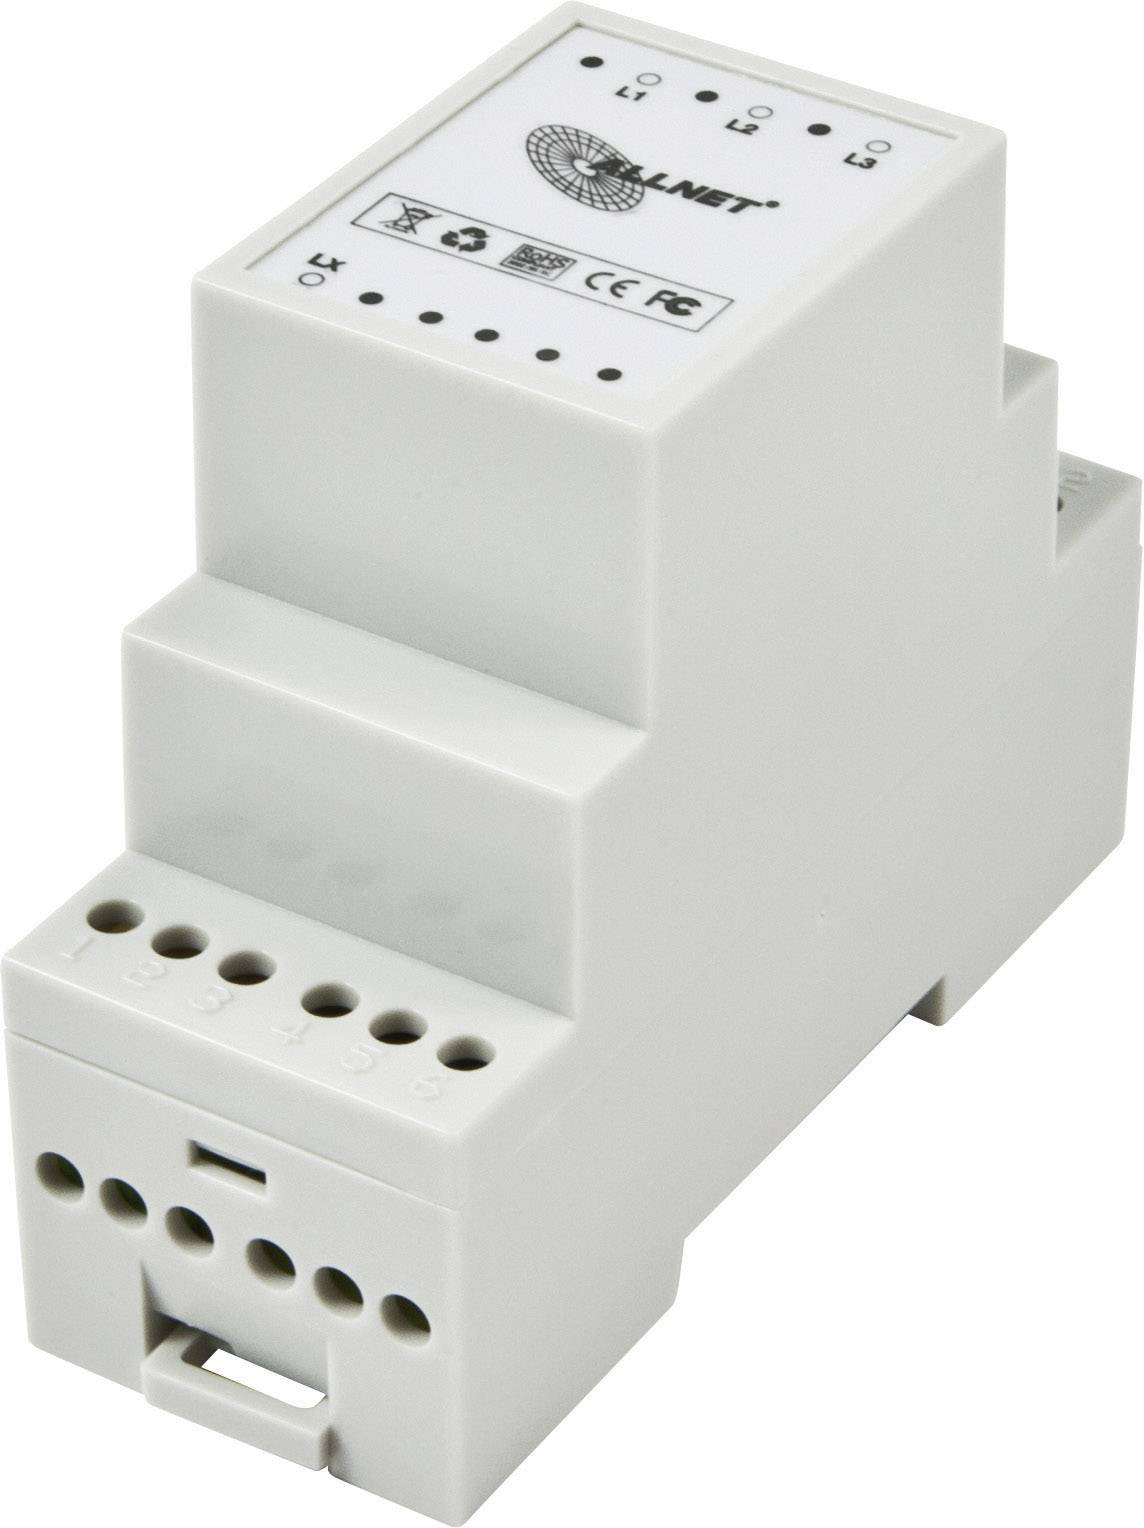 Phase Coupler hotový modul Allnet Powerline ALL1688PC Vstupní napětí (rozsah): 400 V/AC (max.)